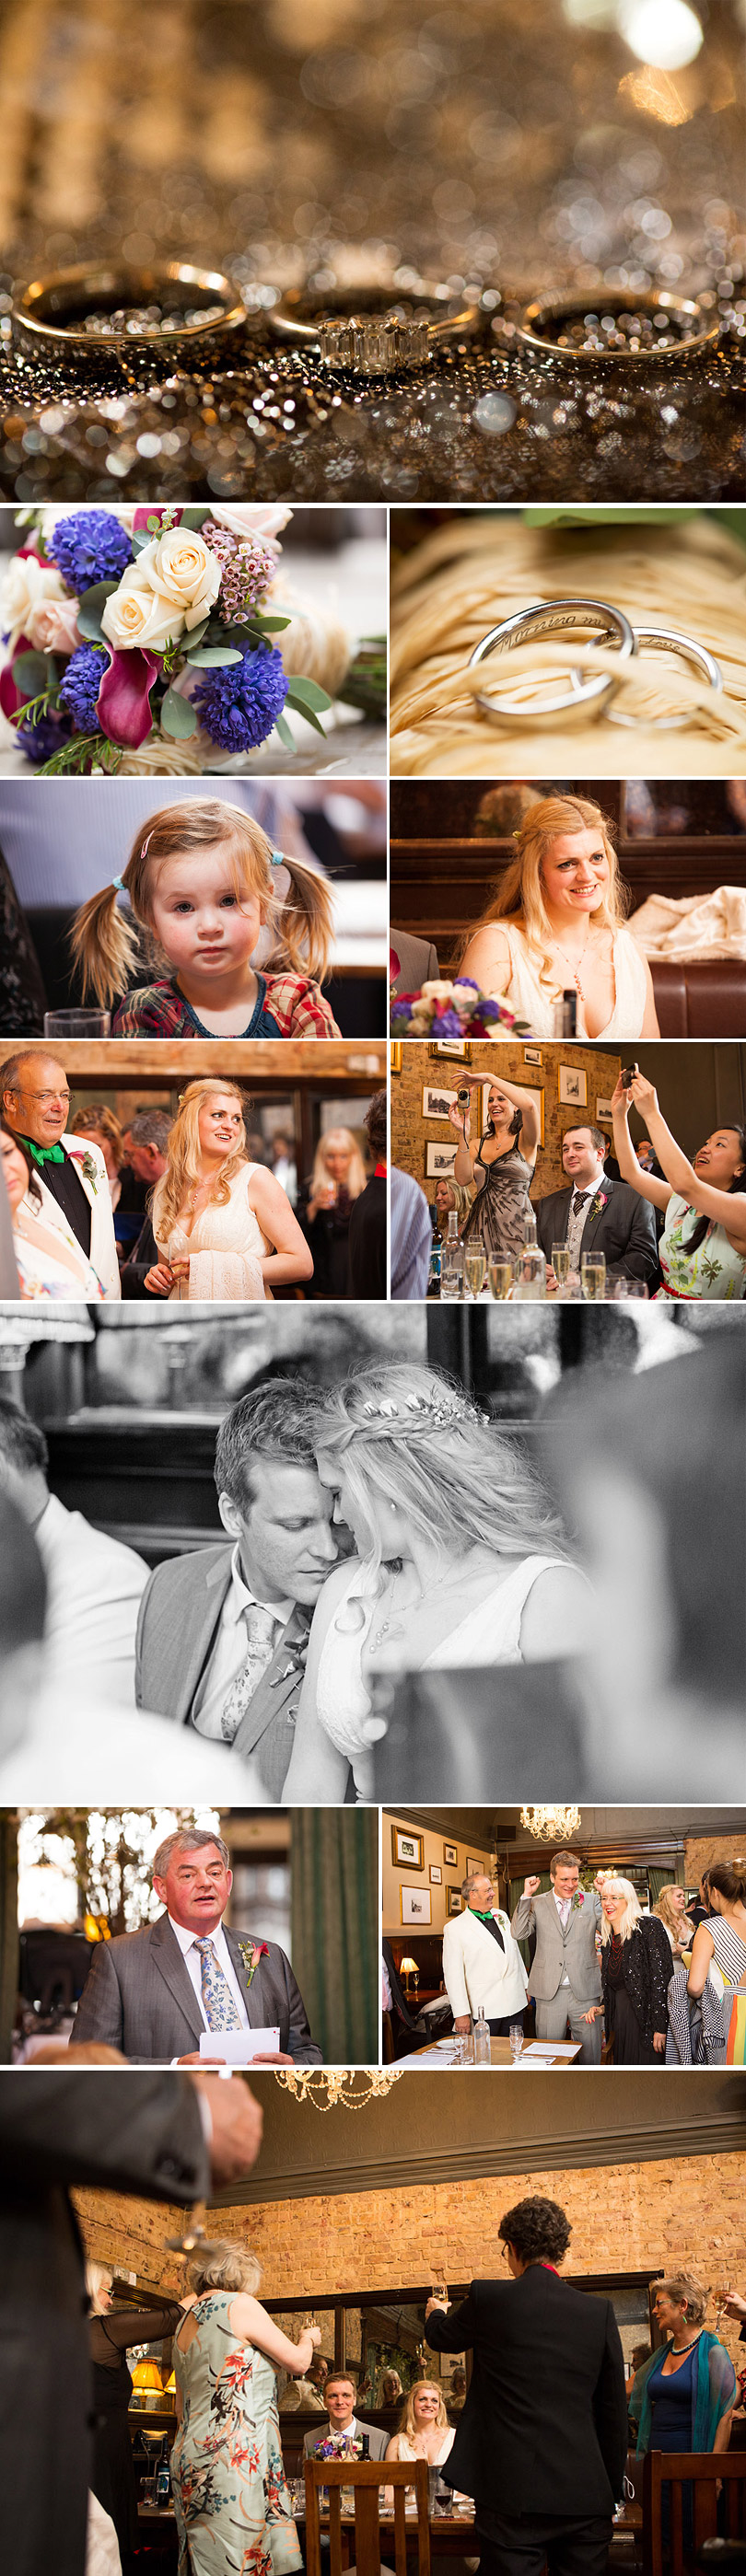 PM-Gallery-Ealing-Wedding-7.jpg